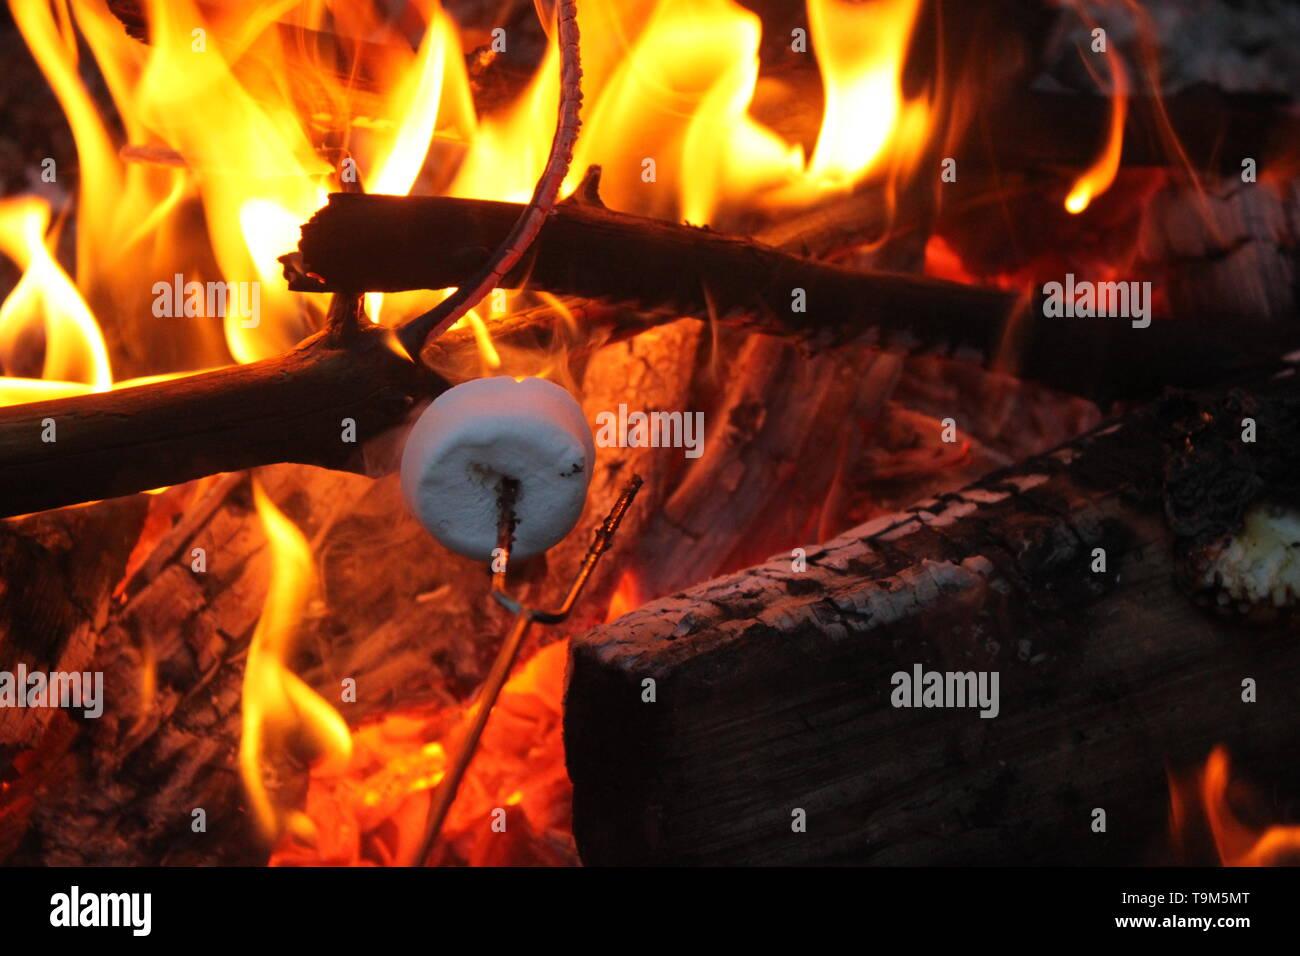 Roasting marshmallows for smores. - Stock Image